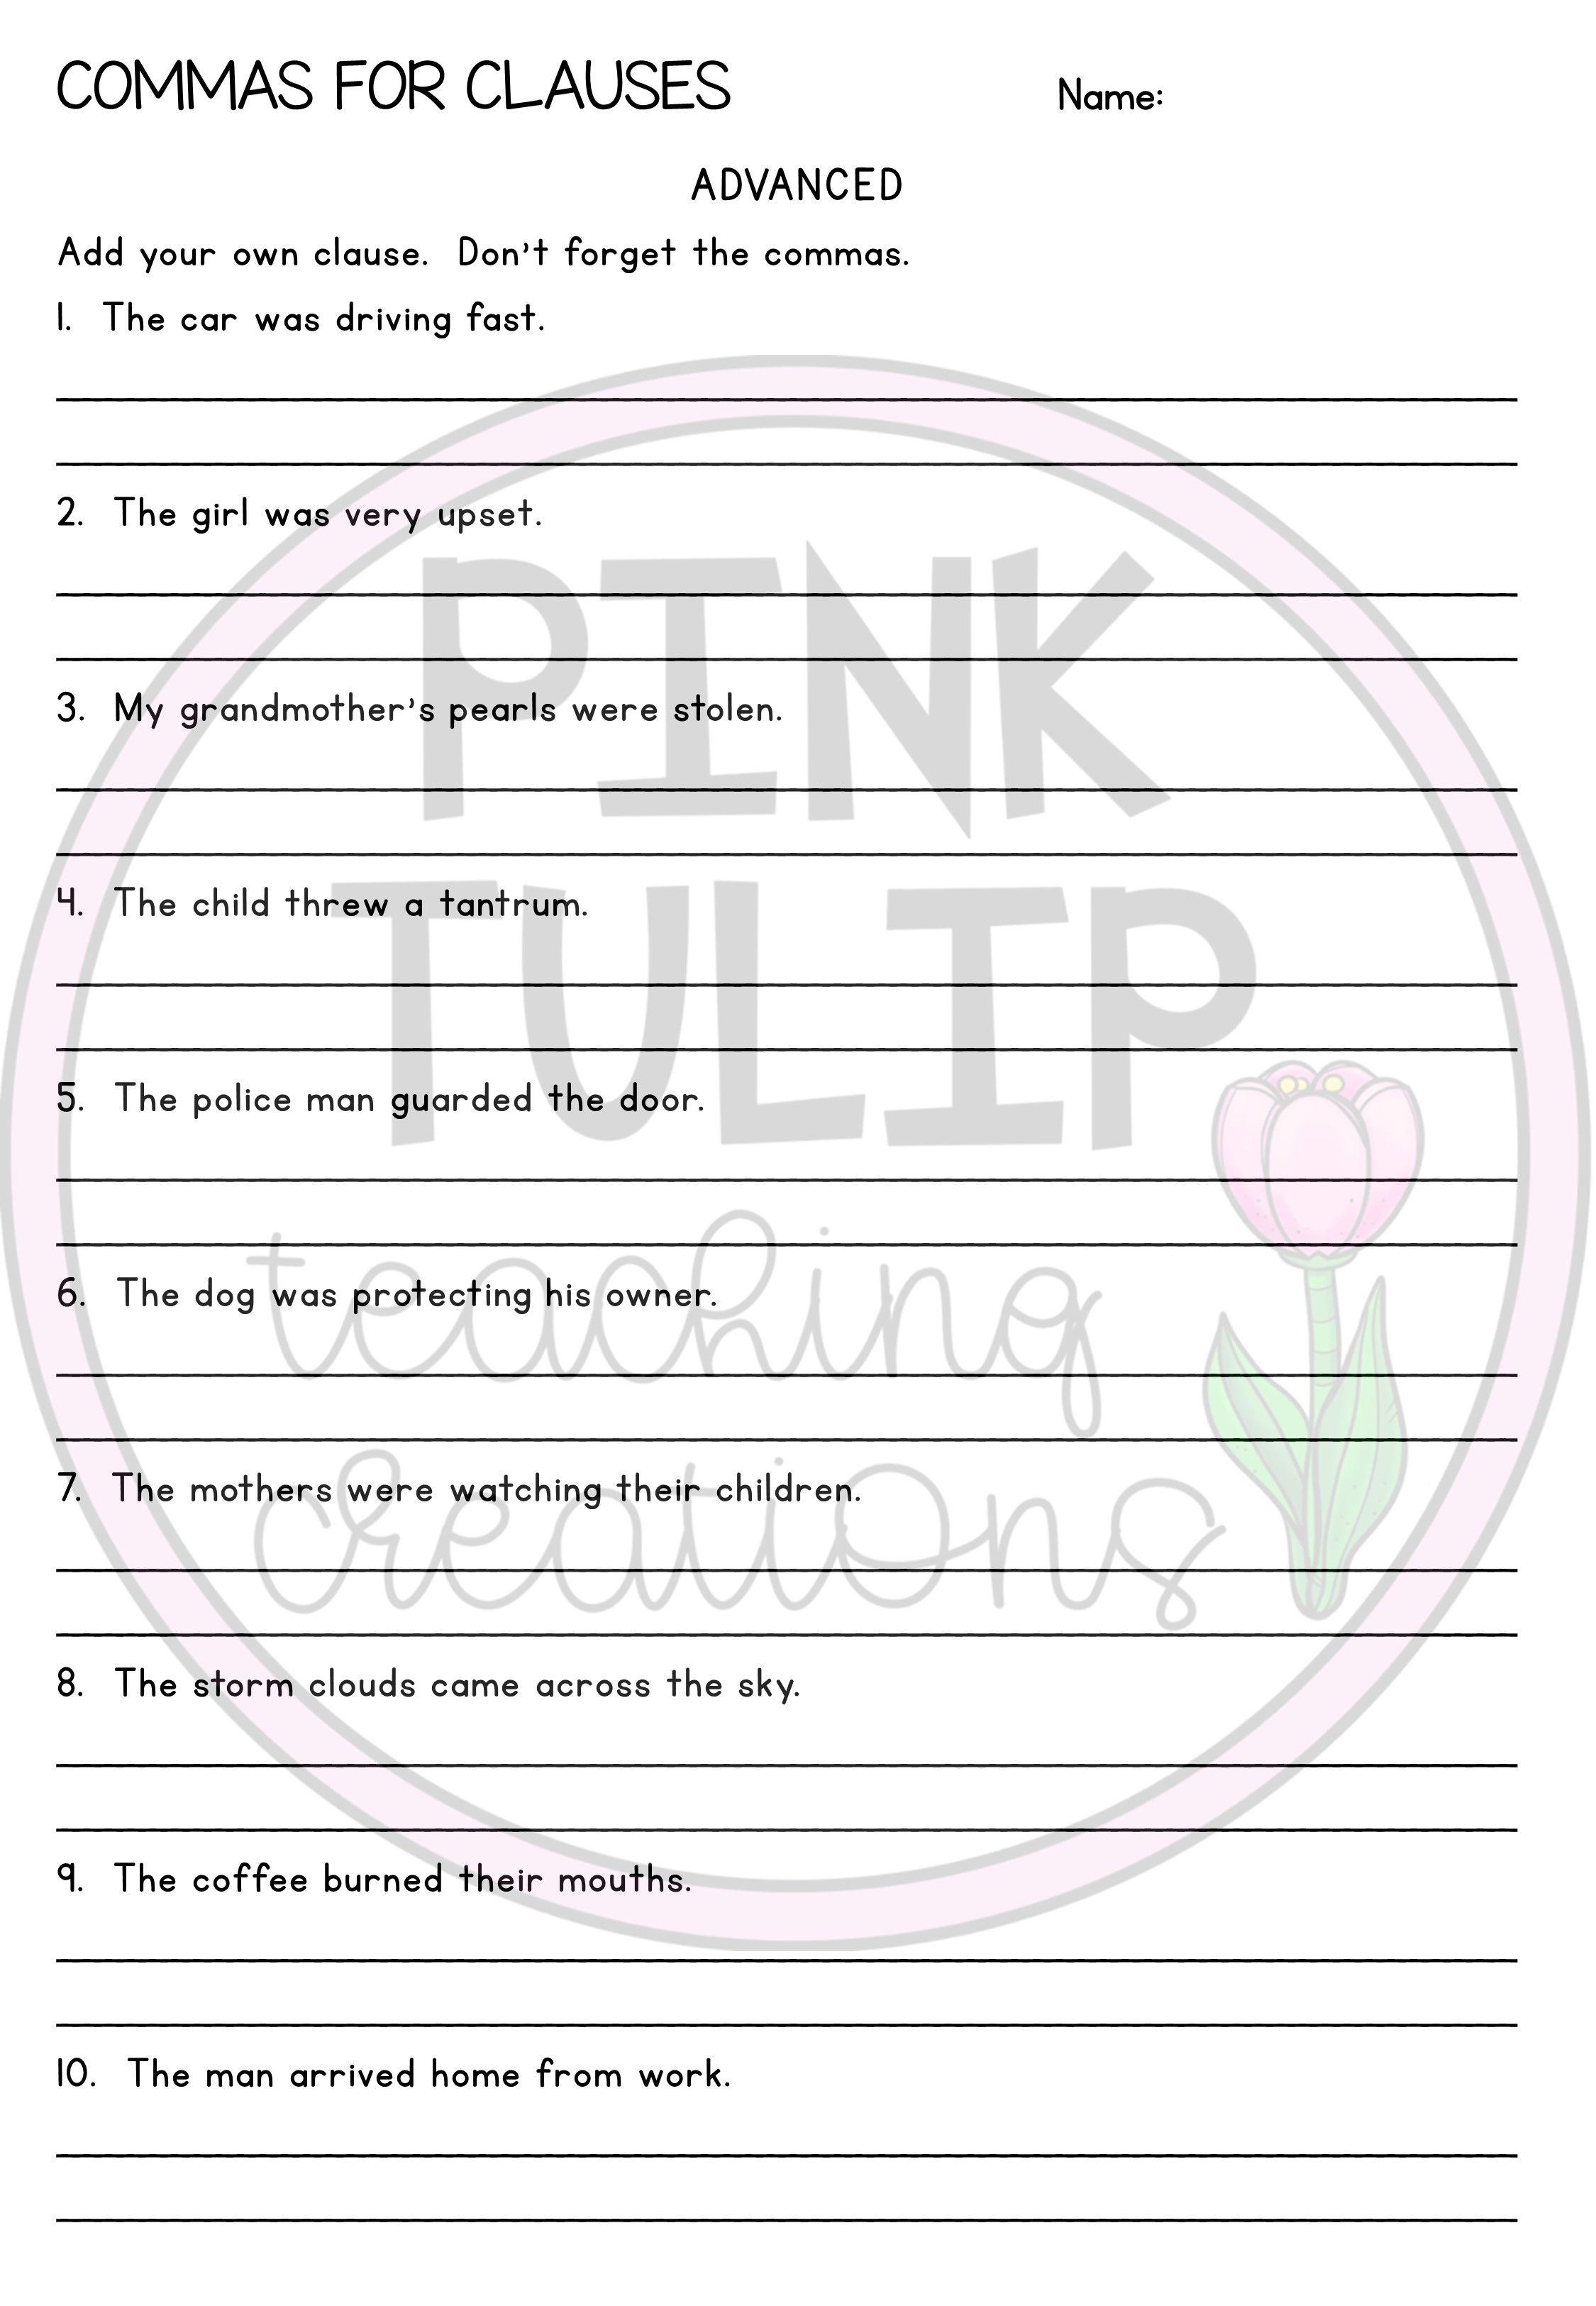 Commas For Clauses Worksheet Grammar Worksheets Grammar Spelling And Grammar